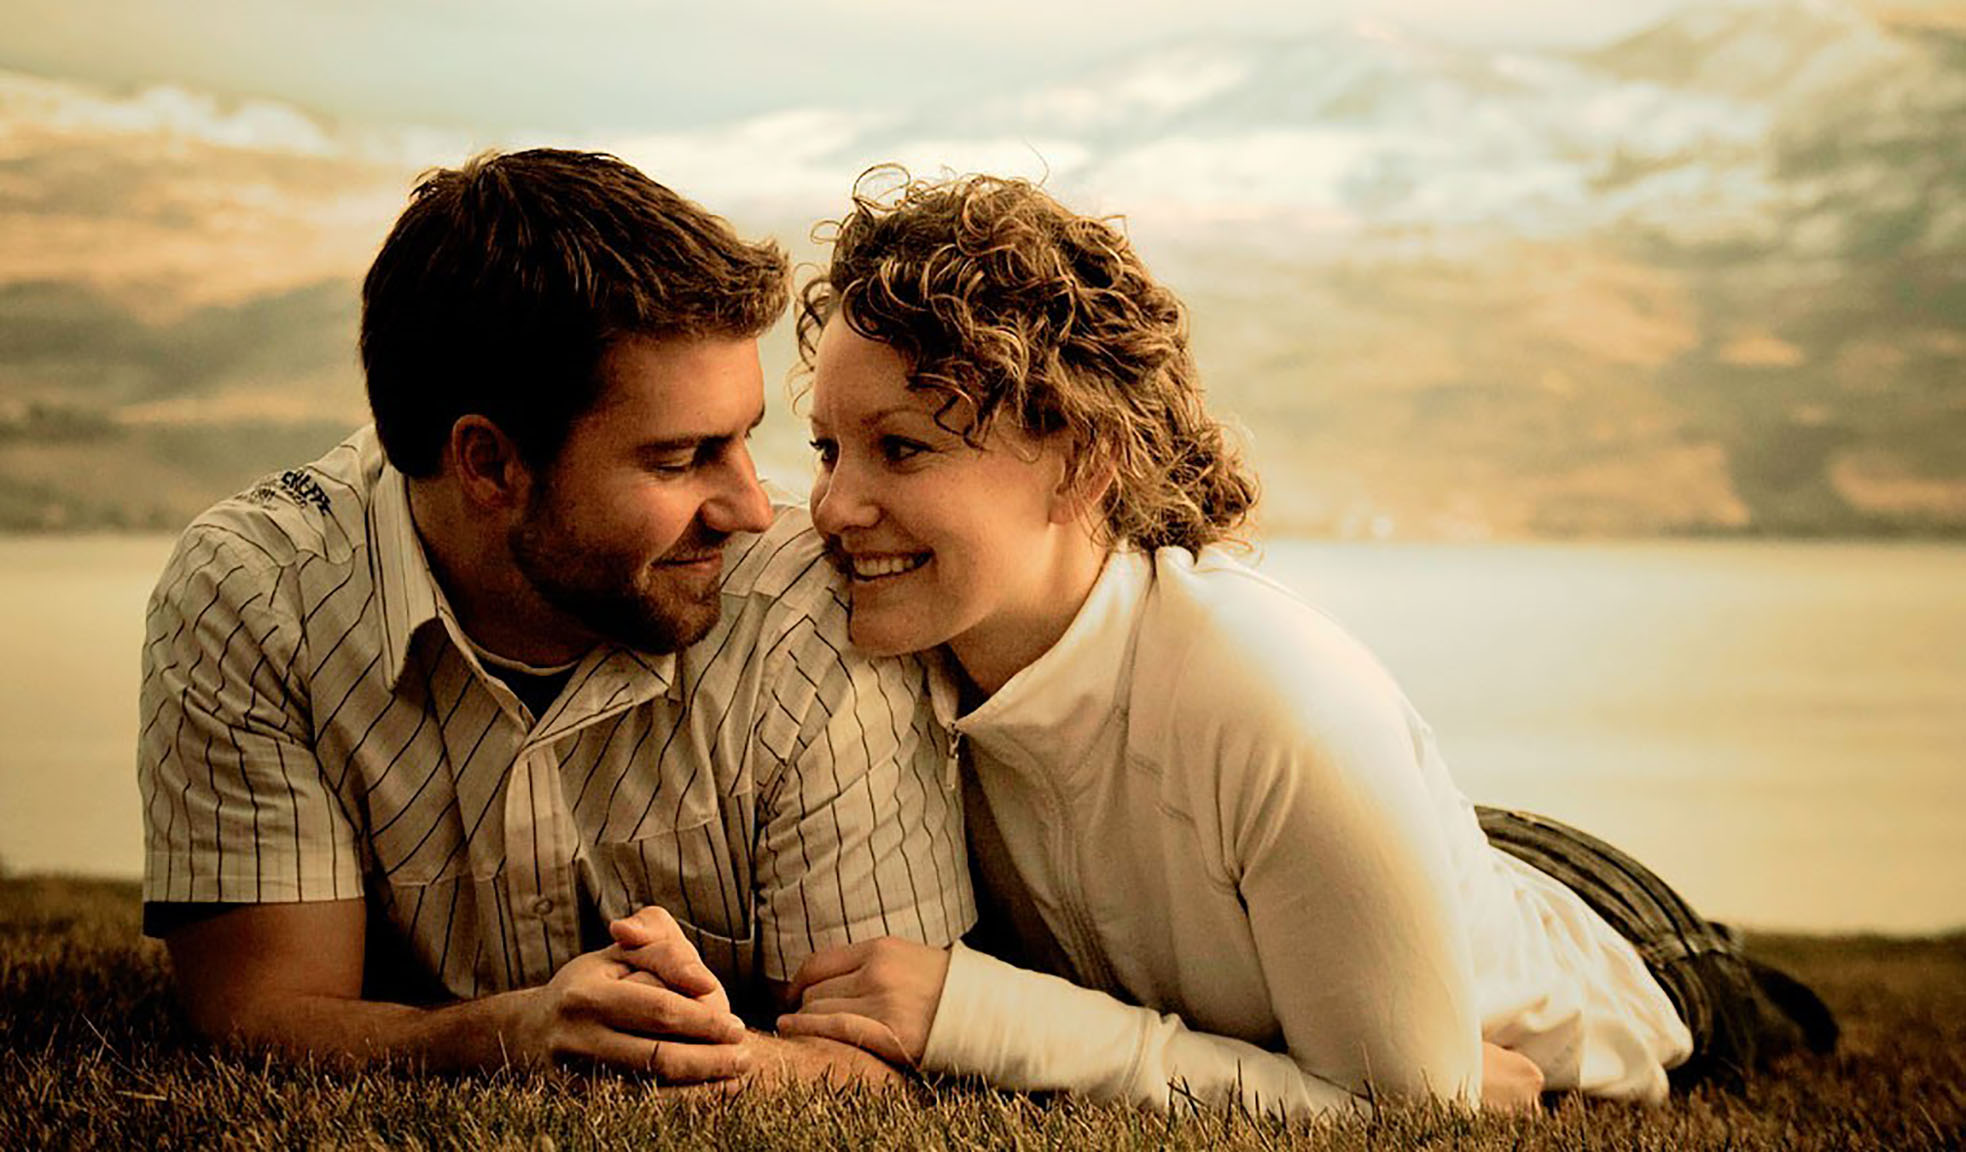 5 Zodiak Yang Paling Serius Dalam Menjalani Hubungan Percintaan 3